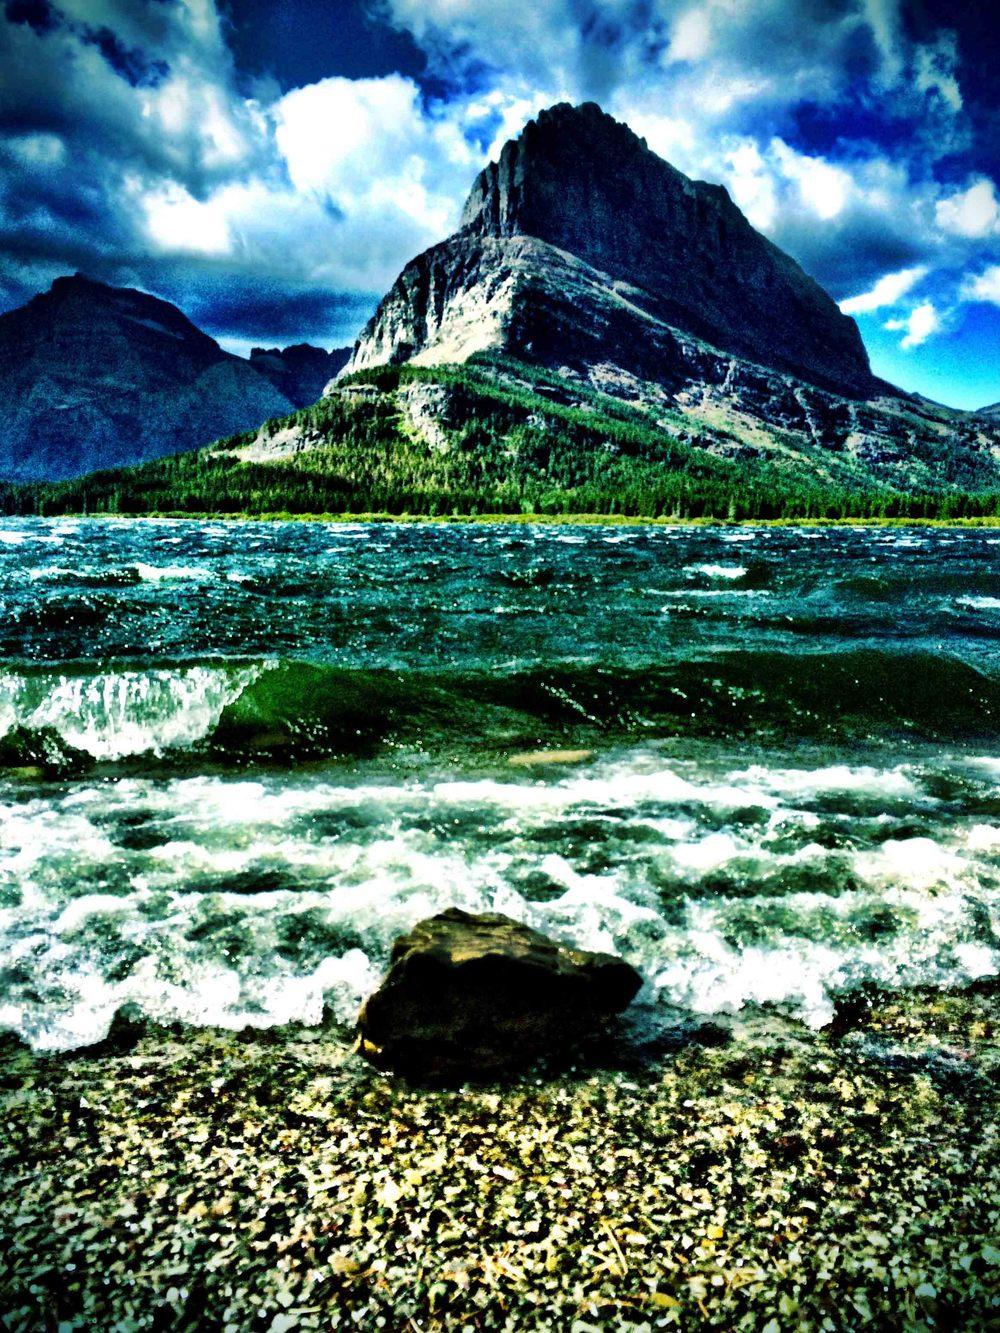 Two Medicine, Glacier National Park, Montana, August 2015